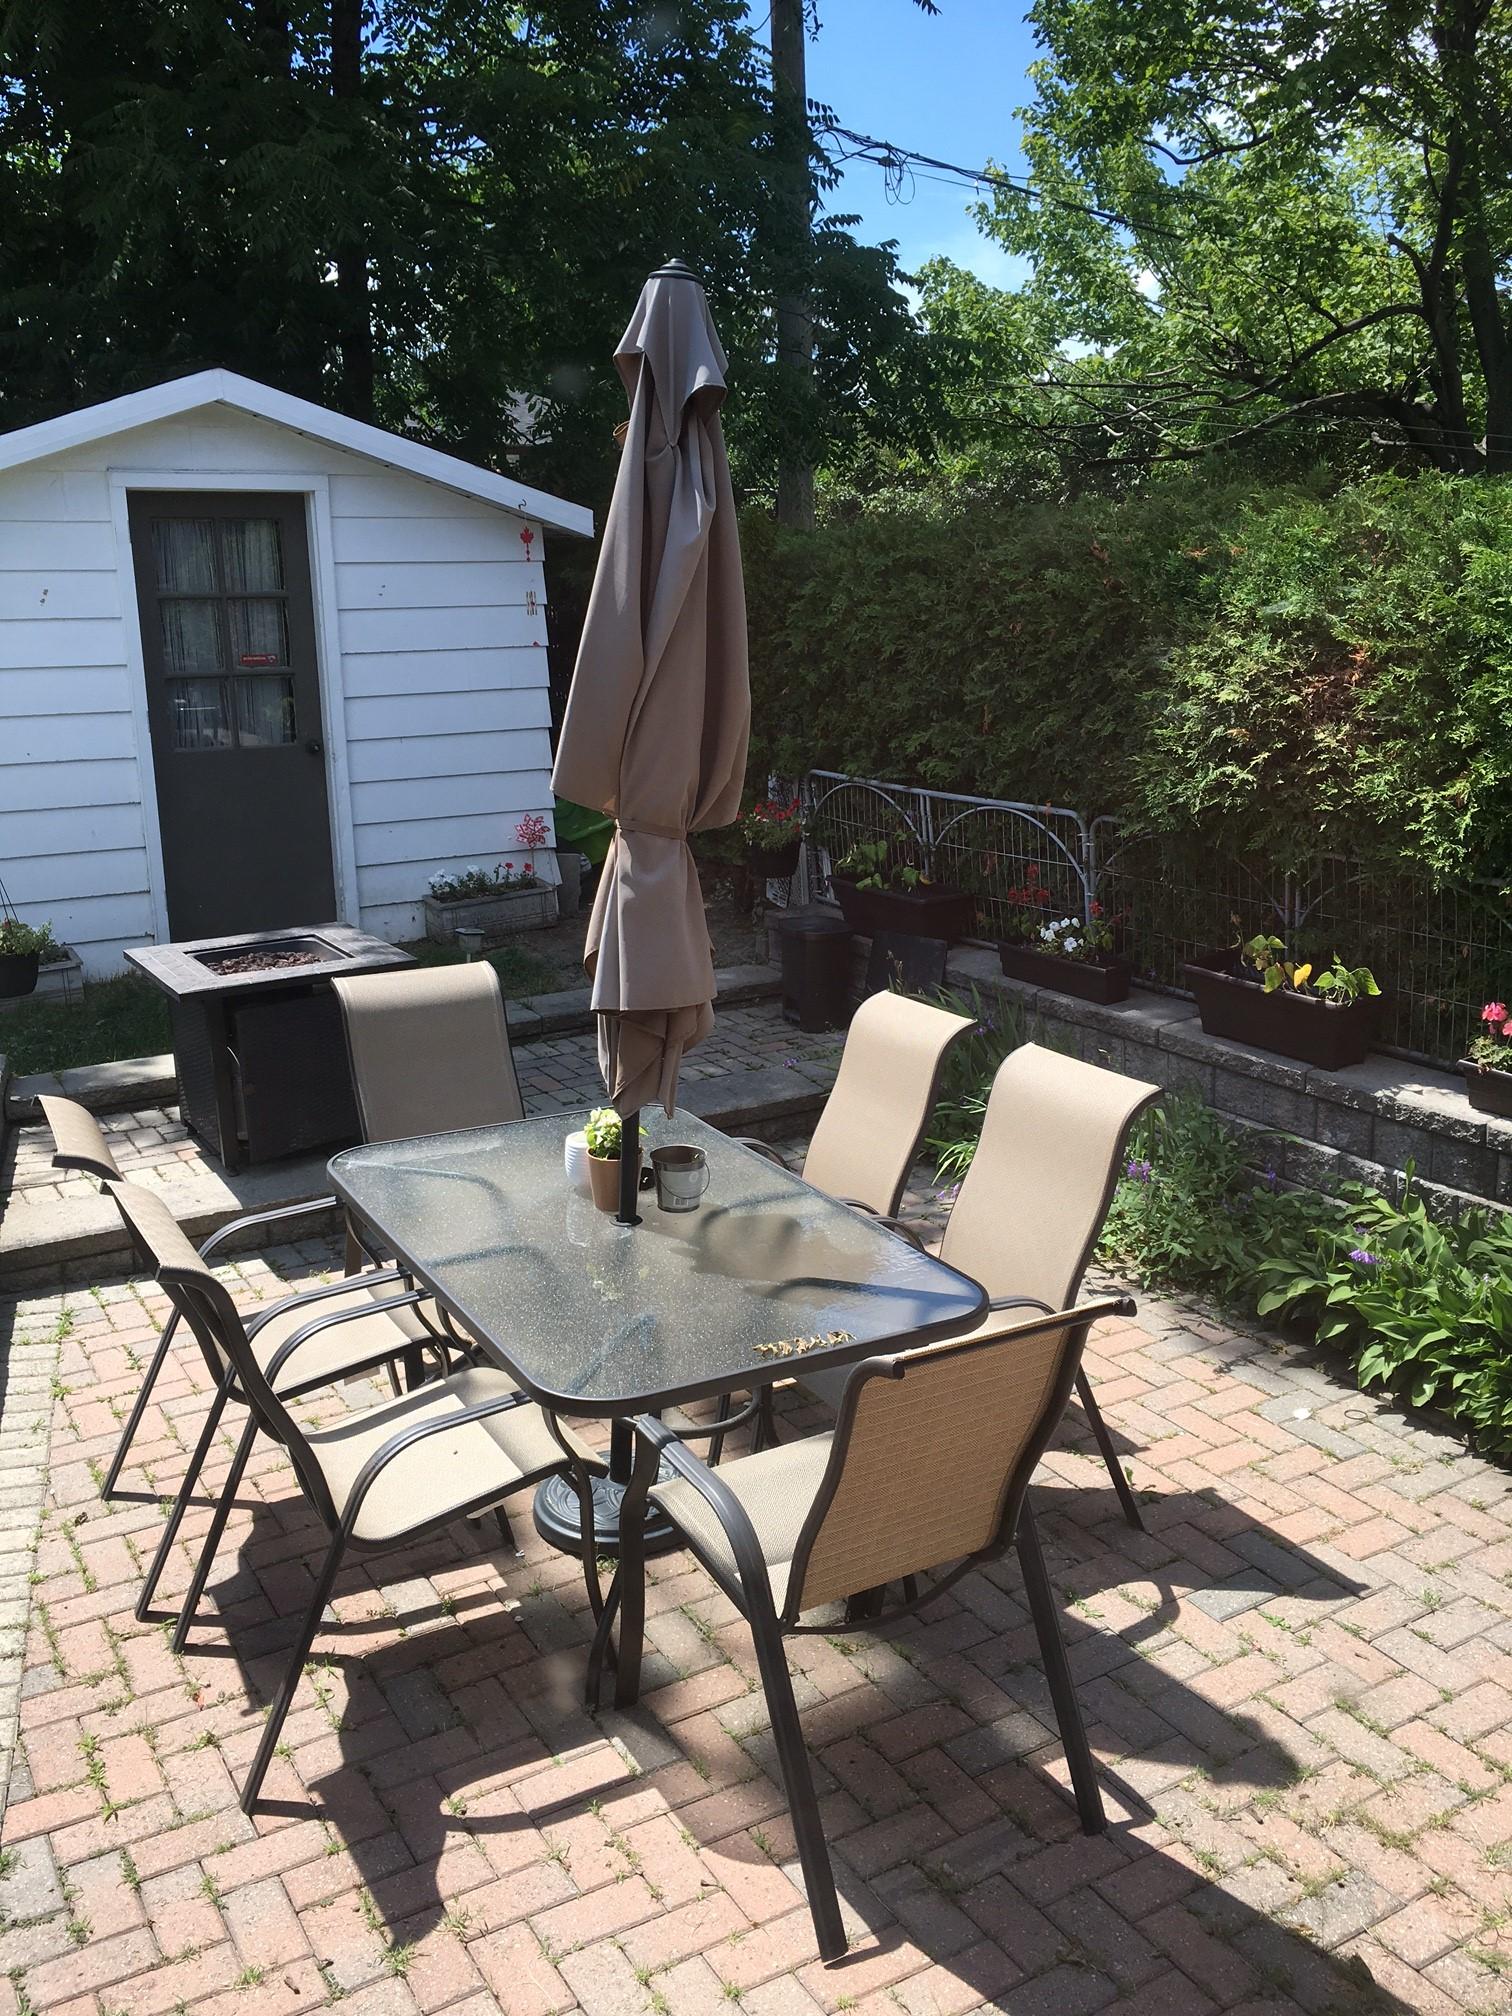 970 Shamir Avenue,Ottawa,Canada,3 Bedrooms Bedrooms,1 BathroomBathrooms,Multi-Family,Shamir Avenue,1007